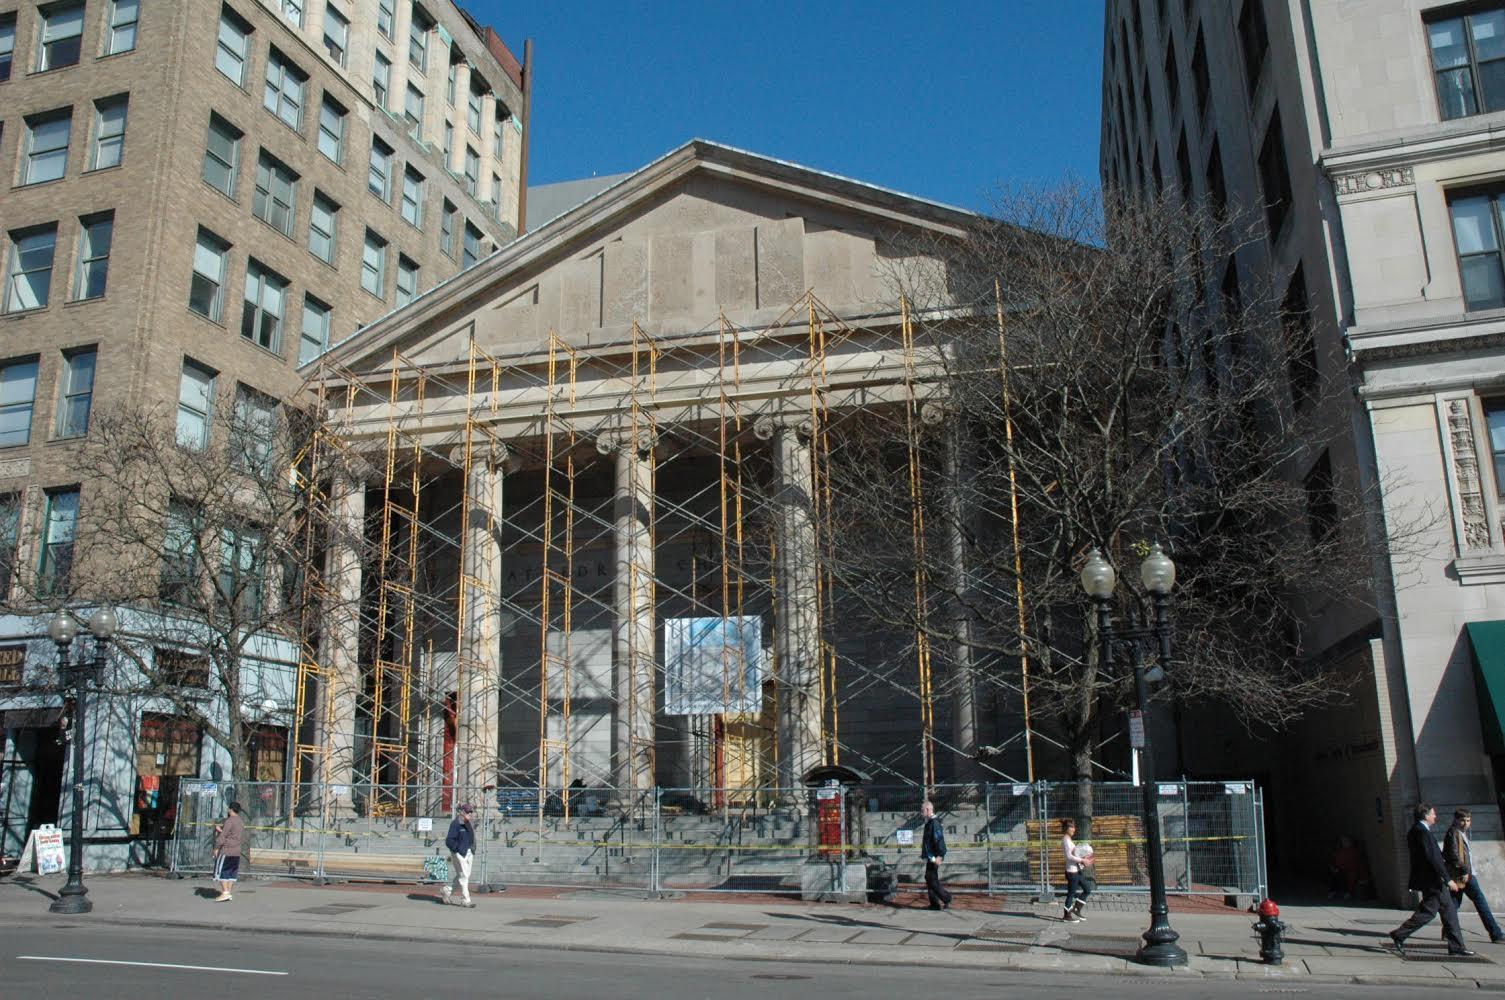 Boston_Ship of Pearl_Donald Lipski_Public Art Services_J Grant Projects_10.jpg